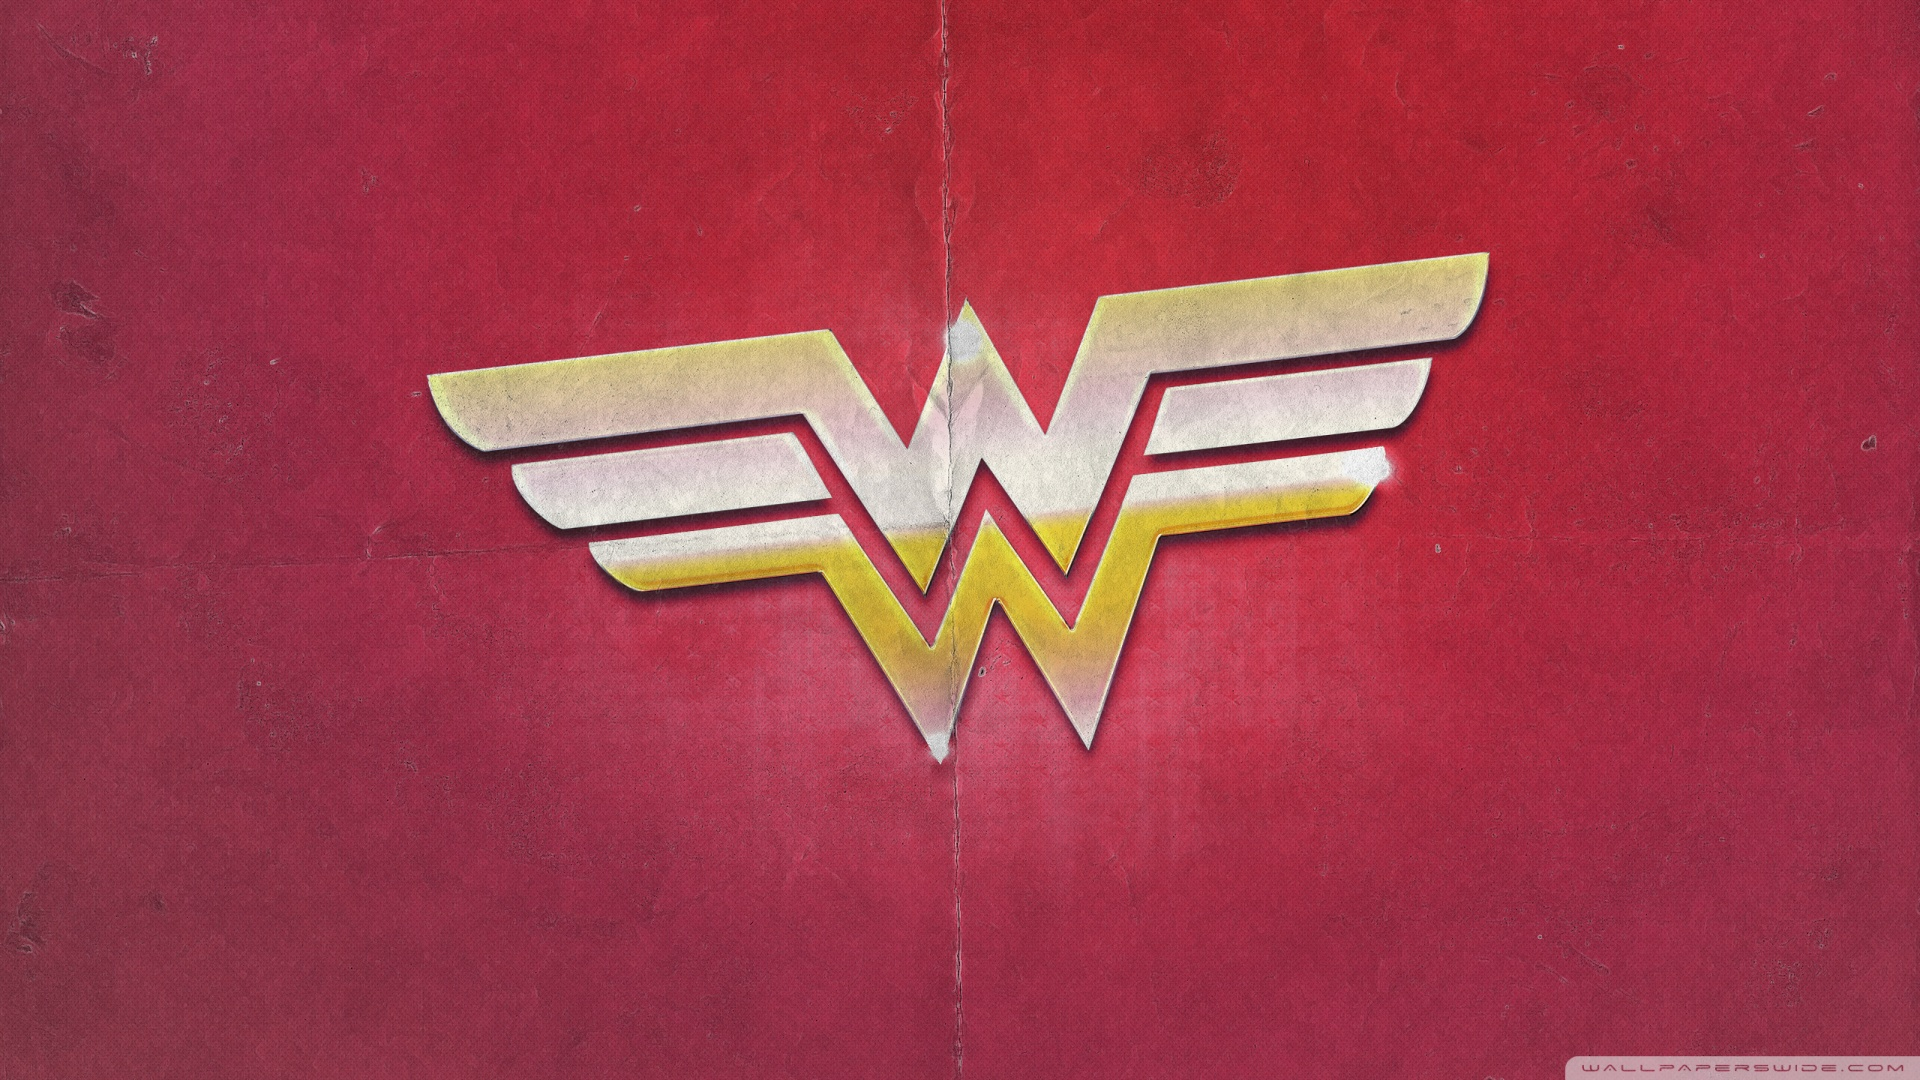 Download Wonder Woman Sign Wallpaper 1920x1080 Wallpoper 1920x1080